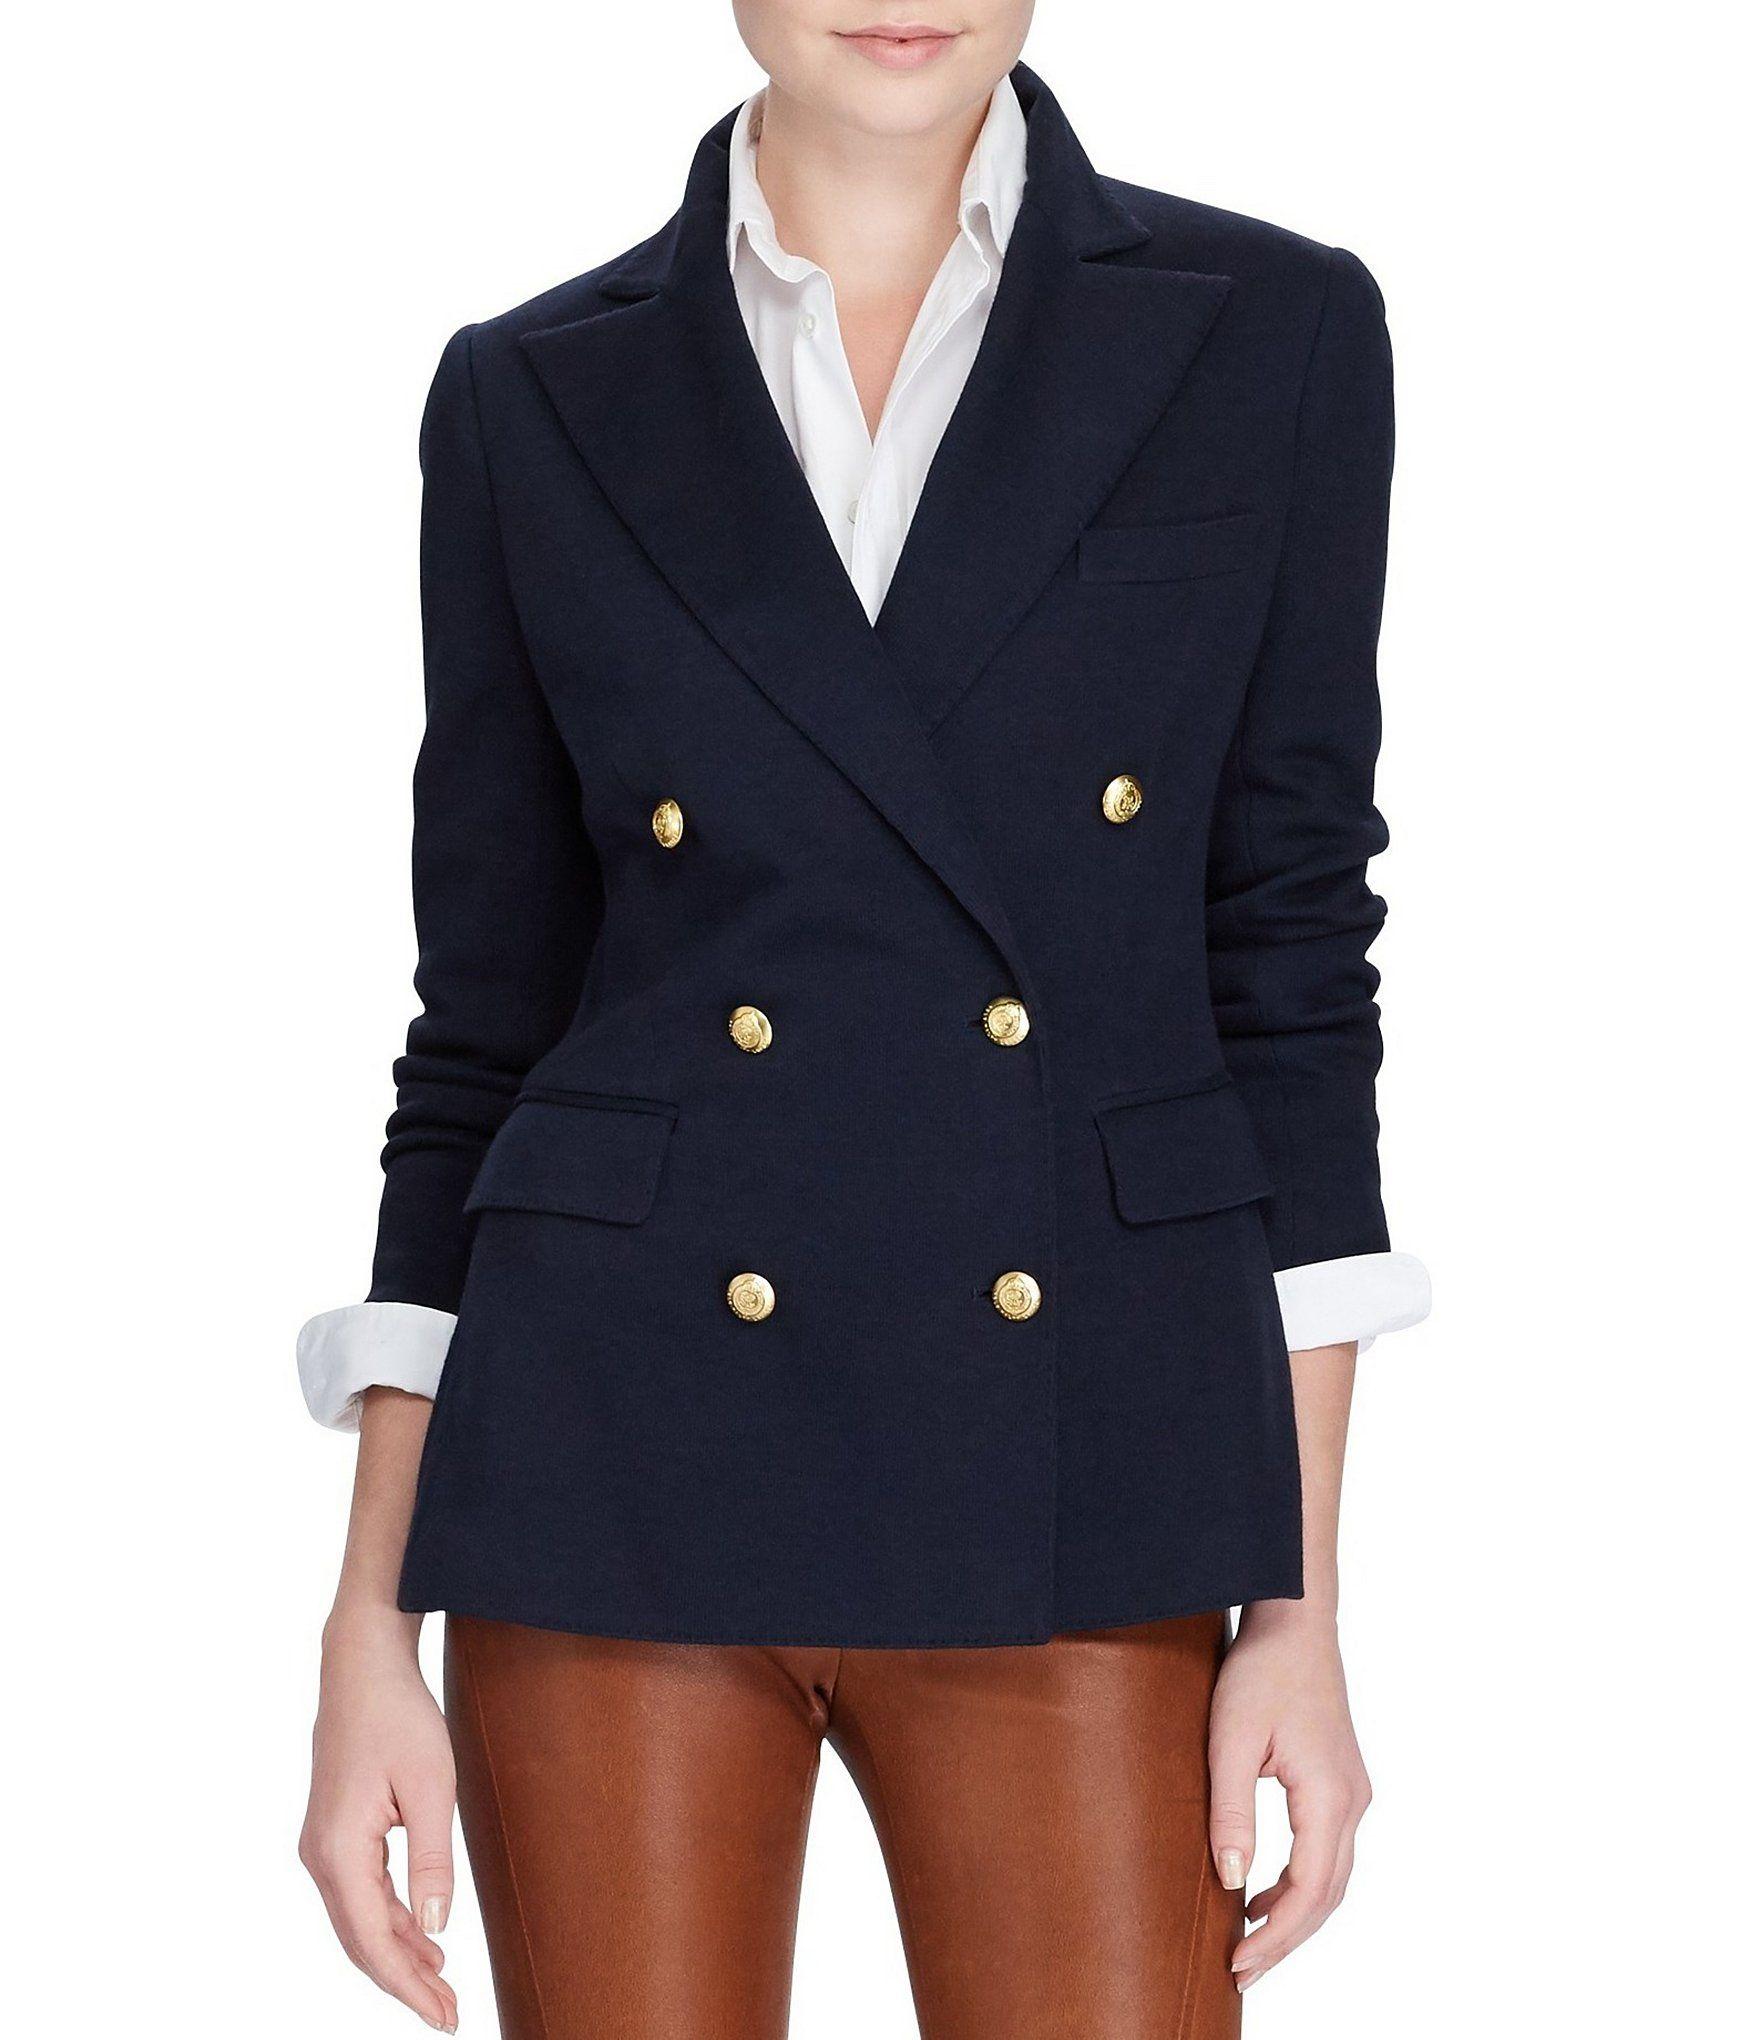 Polo Ralph Lauren Knit Double Breasted Blazer Dillards Blazer Jackets For Women Double Breasted Blazer Womens Fashion Blazer